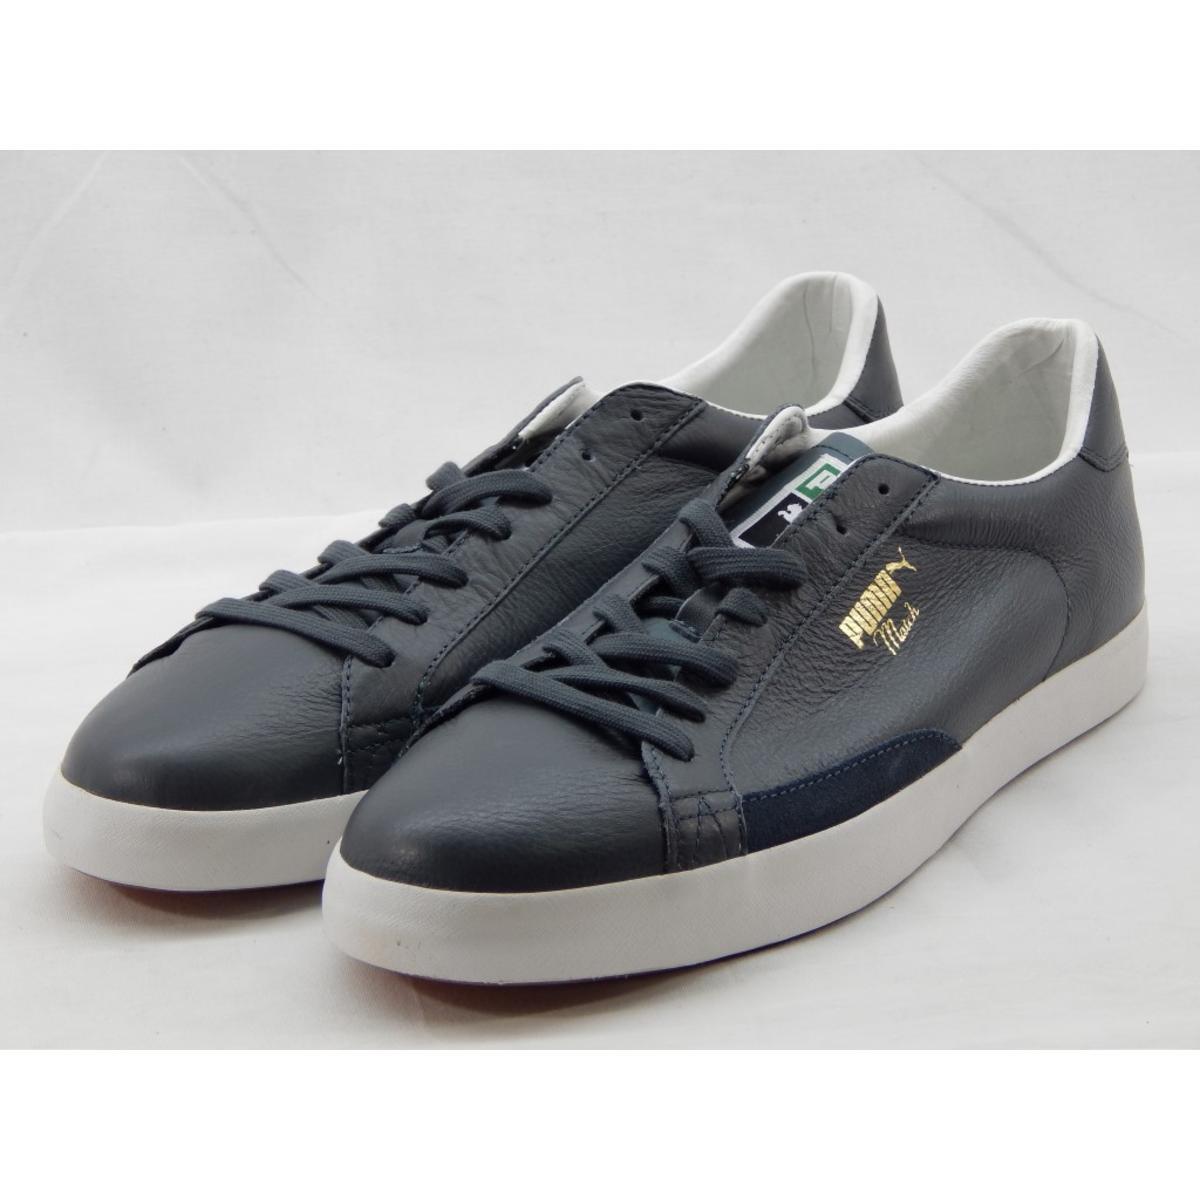 2d207f4789bc Details about Puma Match Vulc Men s Grey Fashion Sneakers 13M